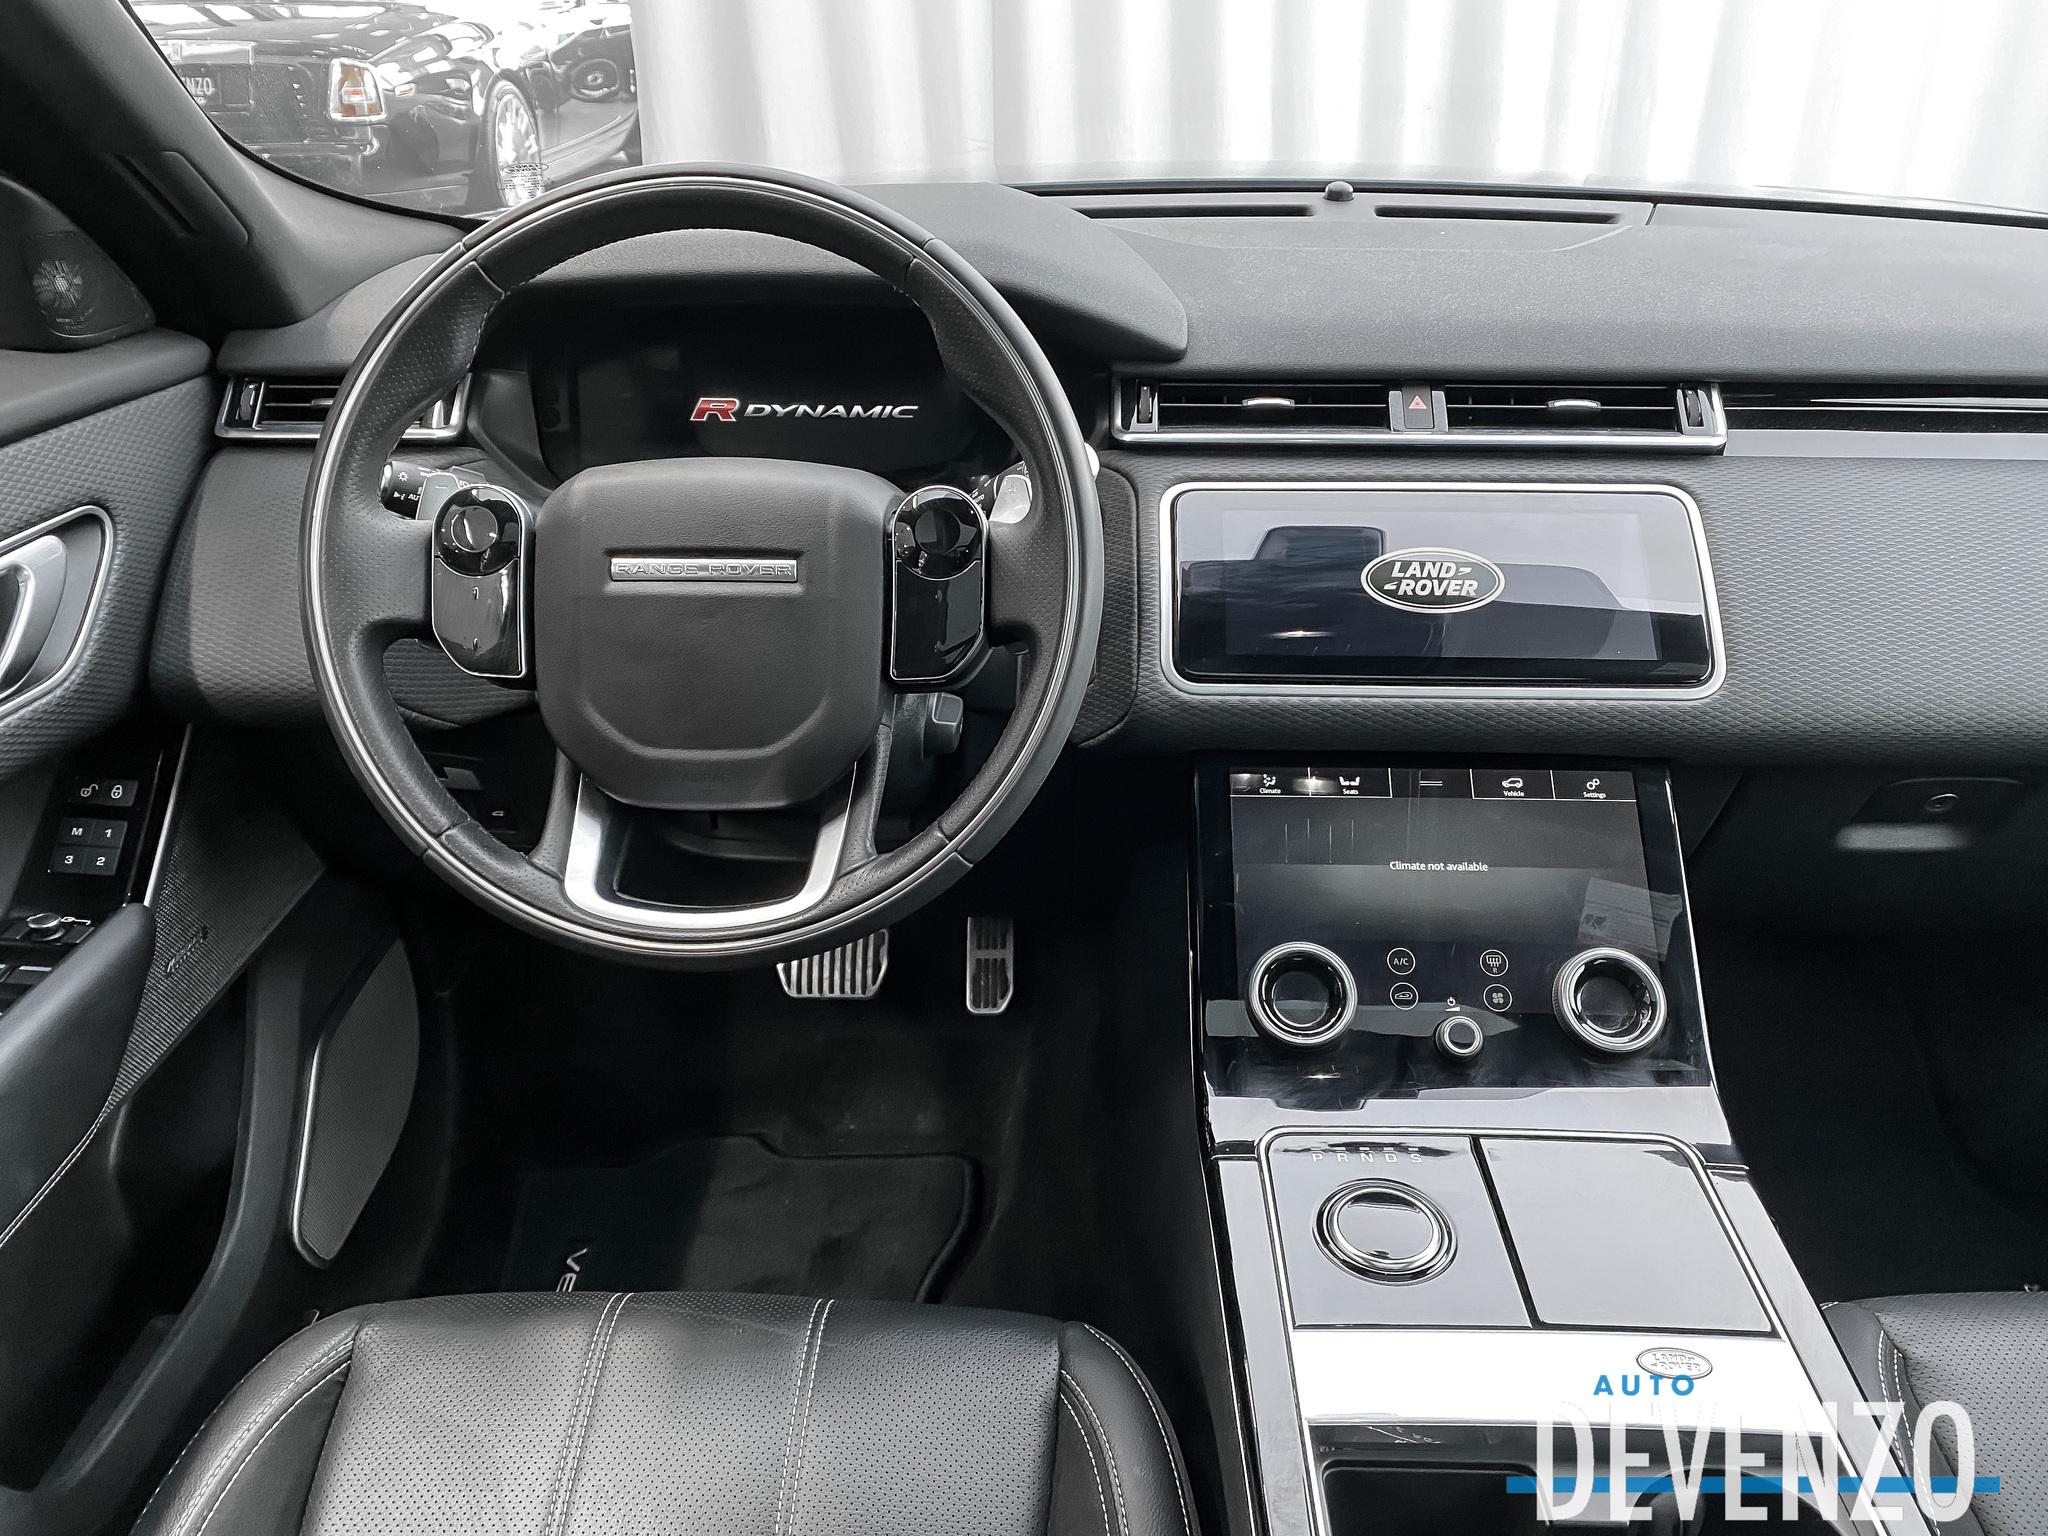 2018 Land Rover Range Rover Velar D180 R-Dynamic SE Diesel Navi / 360 Camera / Toit complet